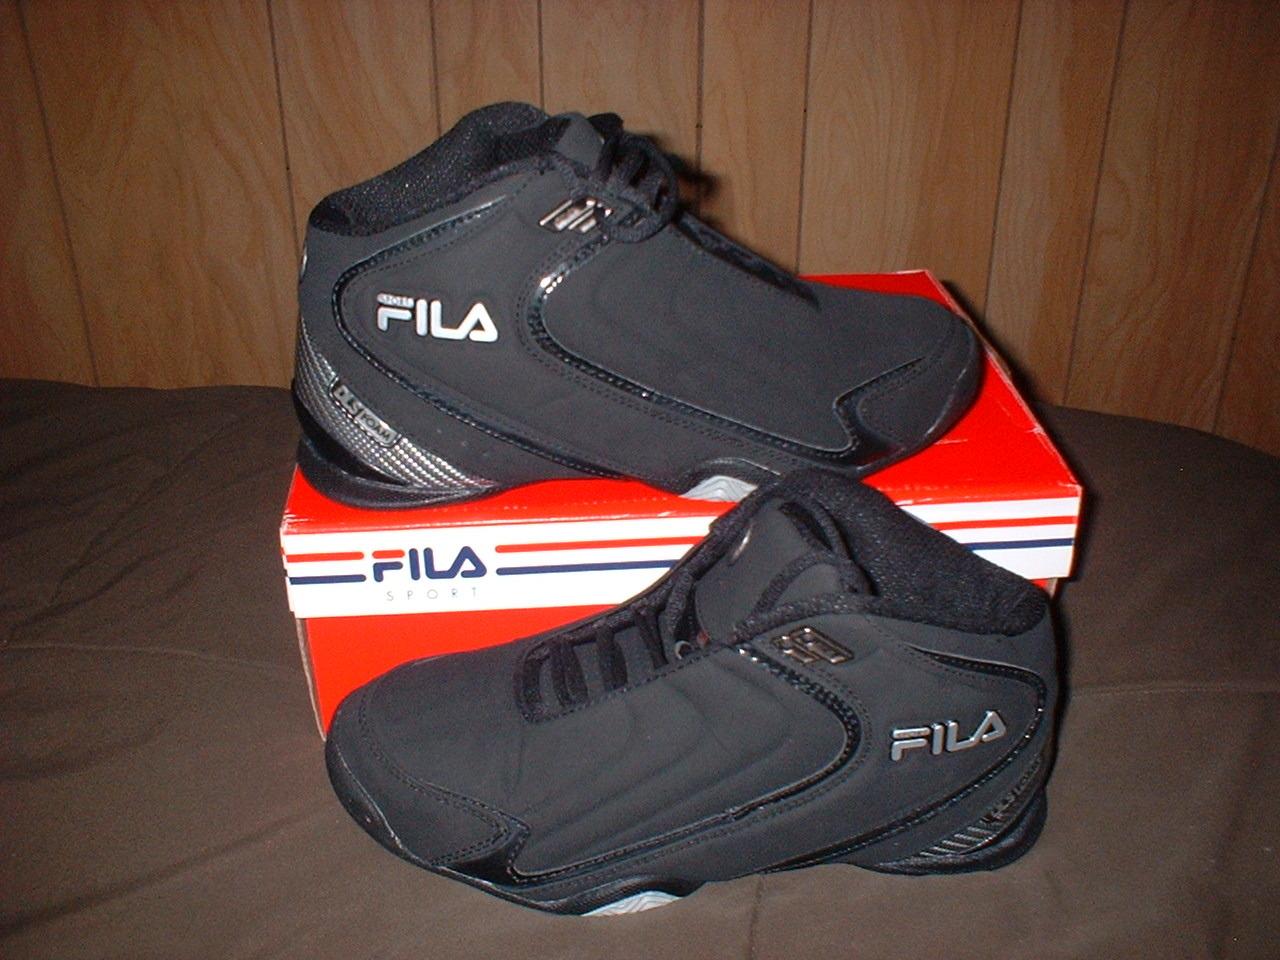 881e312a8590 Men s Fila RIMSHOT Basketball Shoes BLACK and similar items